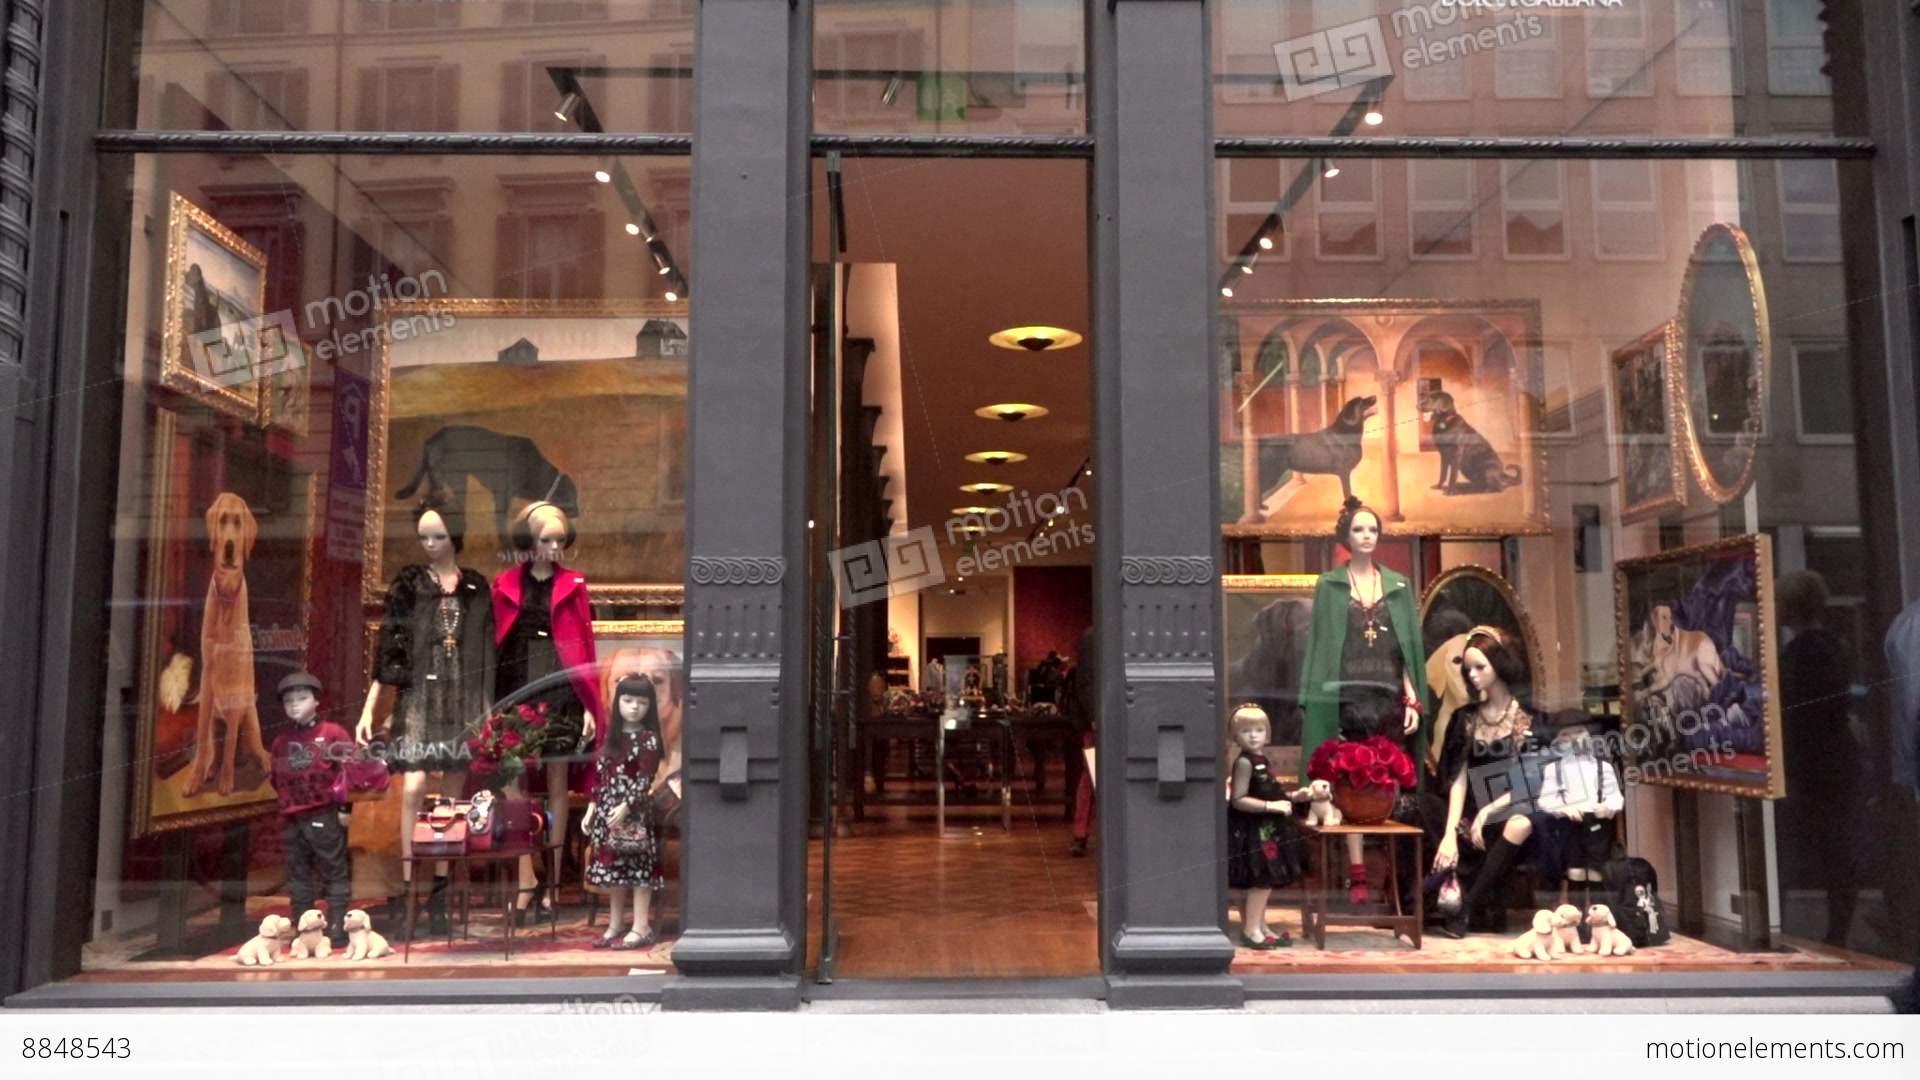 dd659e5879 Dolce Gabbana Shop Store Fashion Shopping Milan Milano... Stock Video  Footage